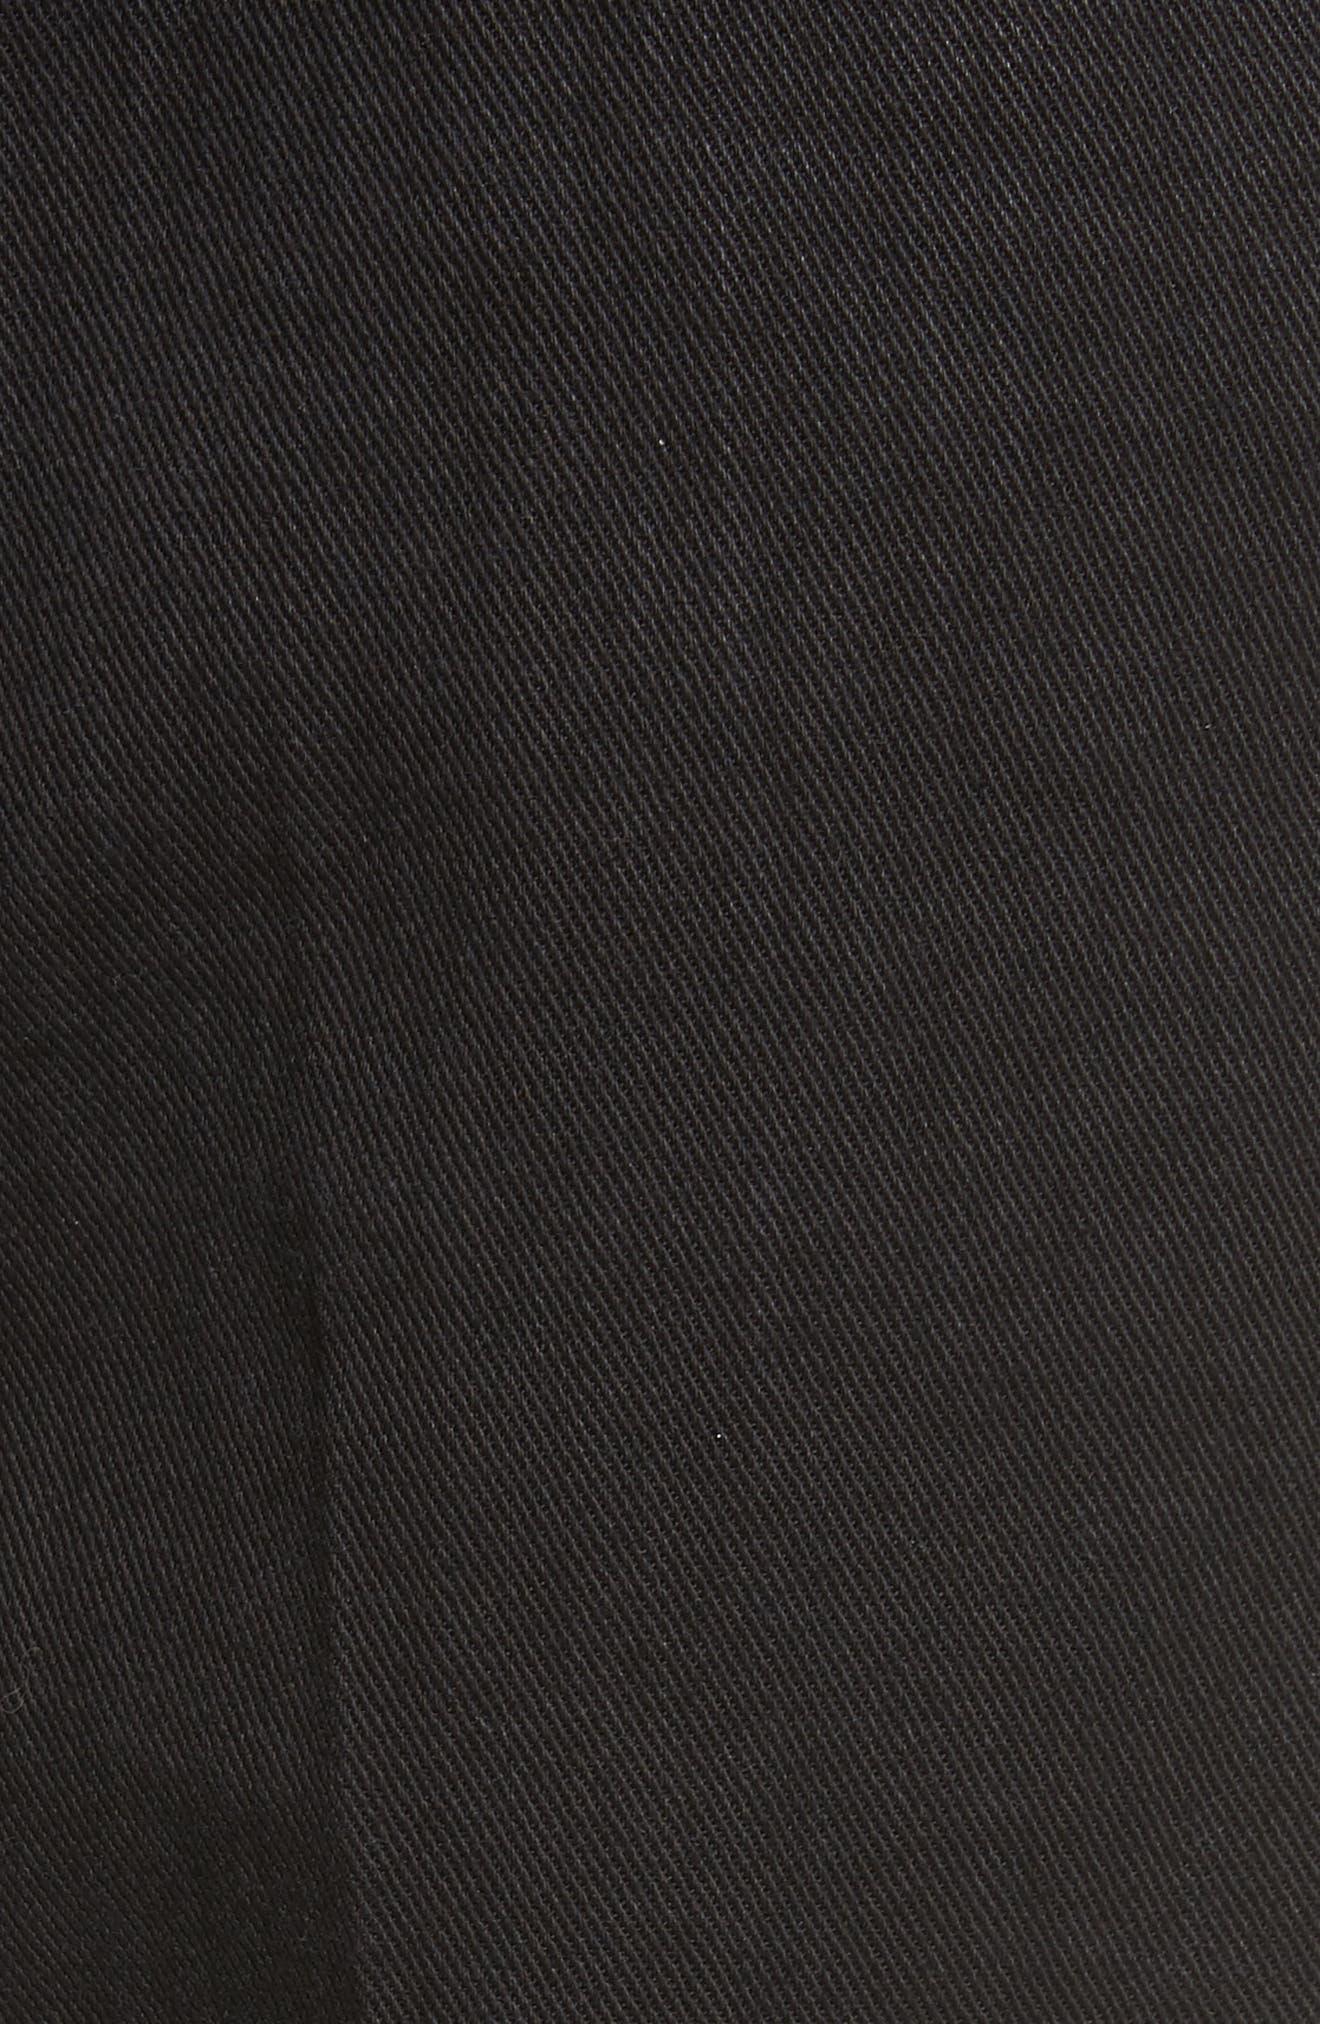 Just Wash Point Hem Wide Leg Jeans,                             Alternate thumbnail 7, color,                             Black